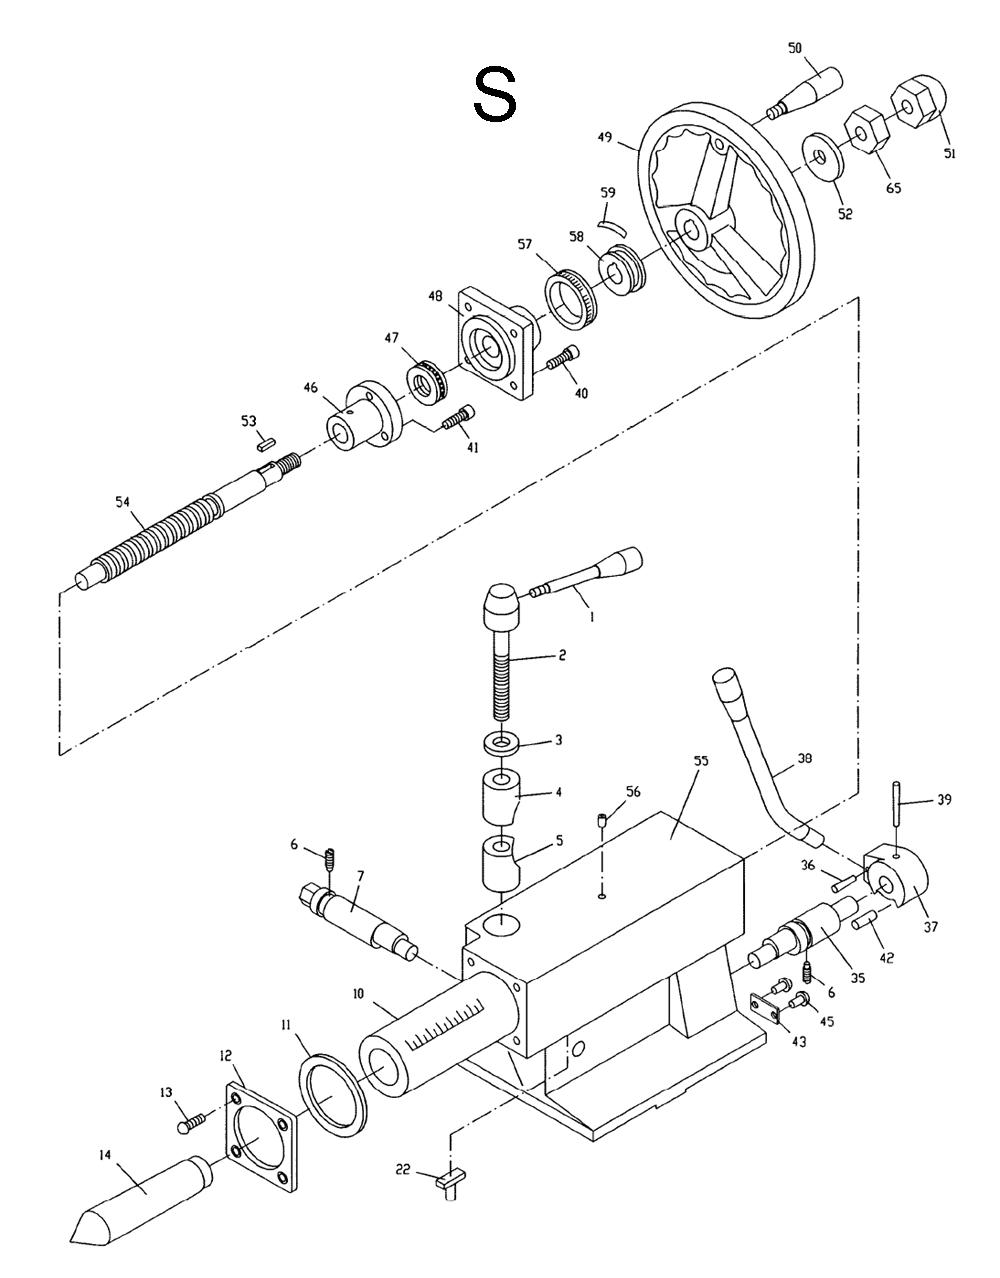 321610-jet-PB-19Break Down